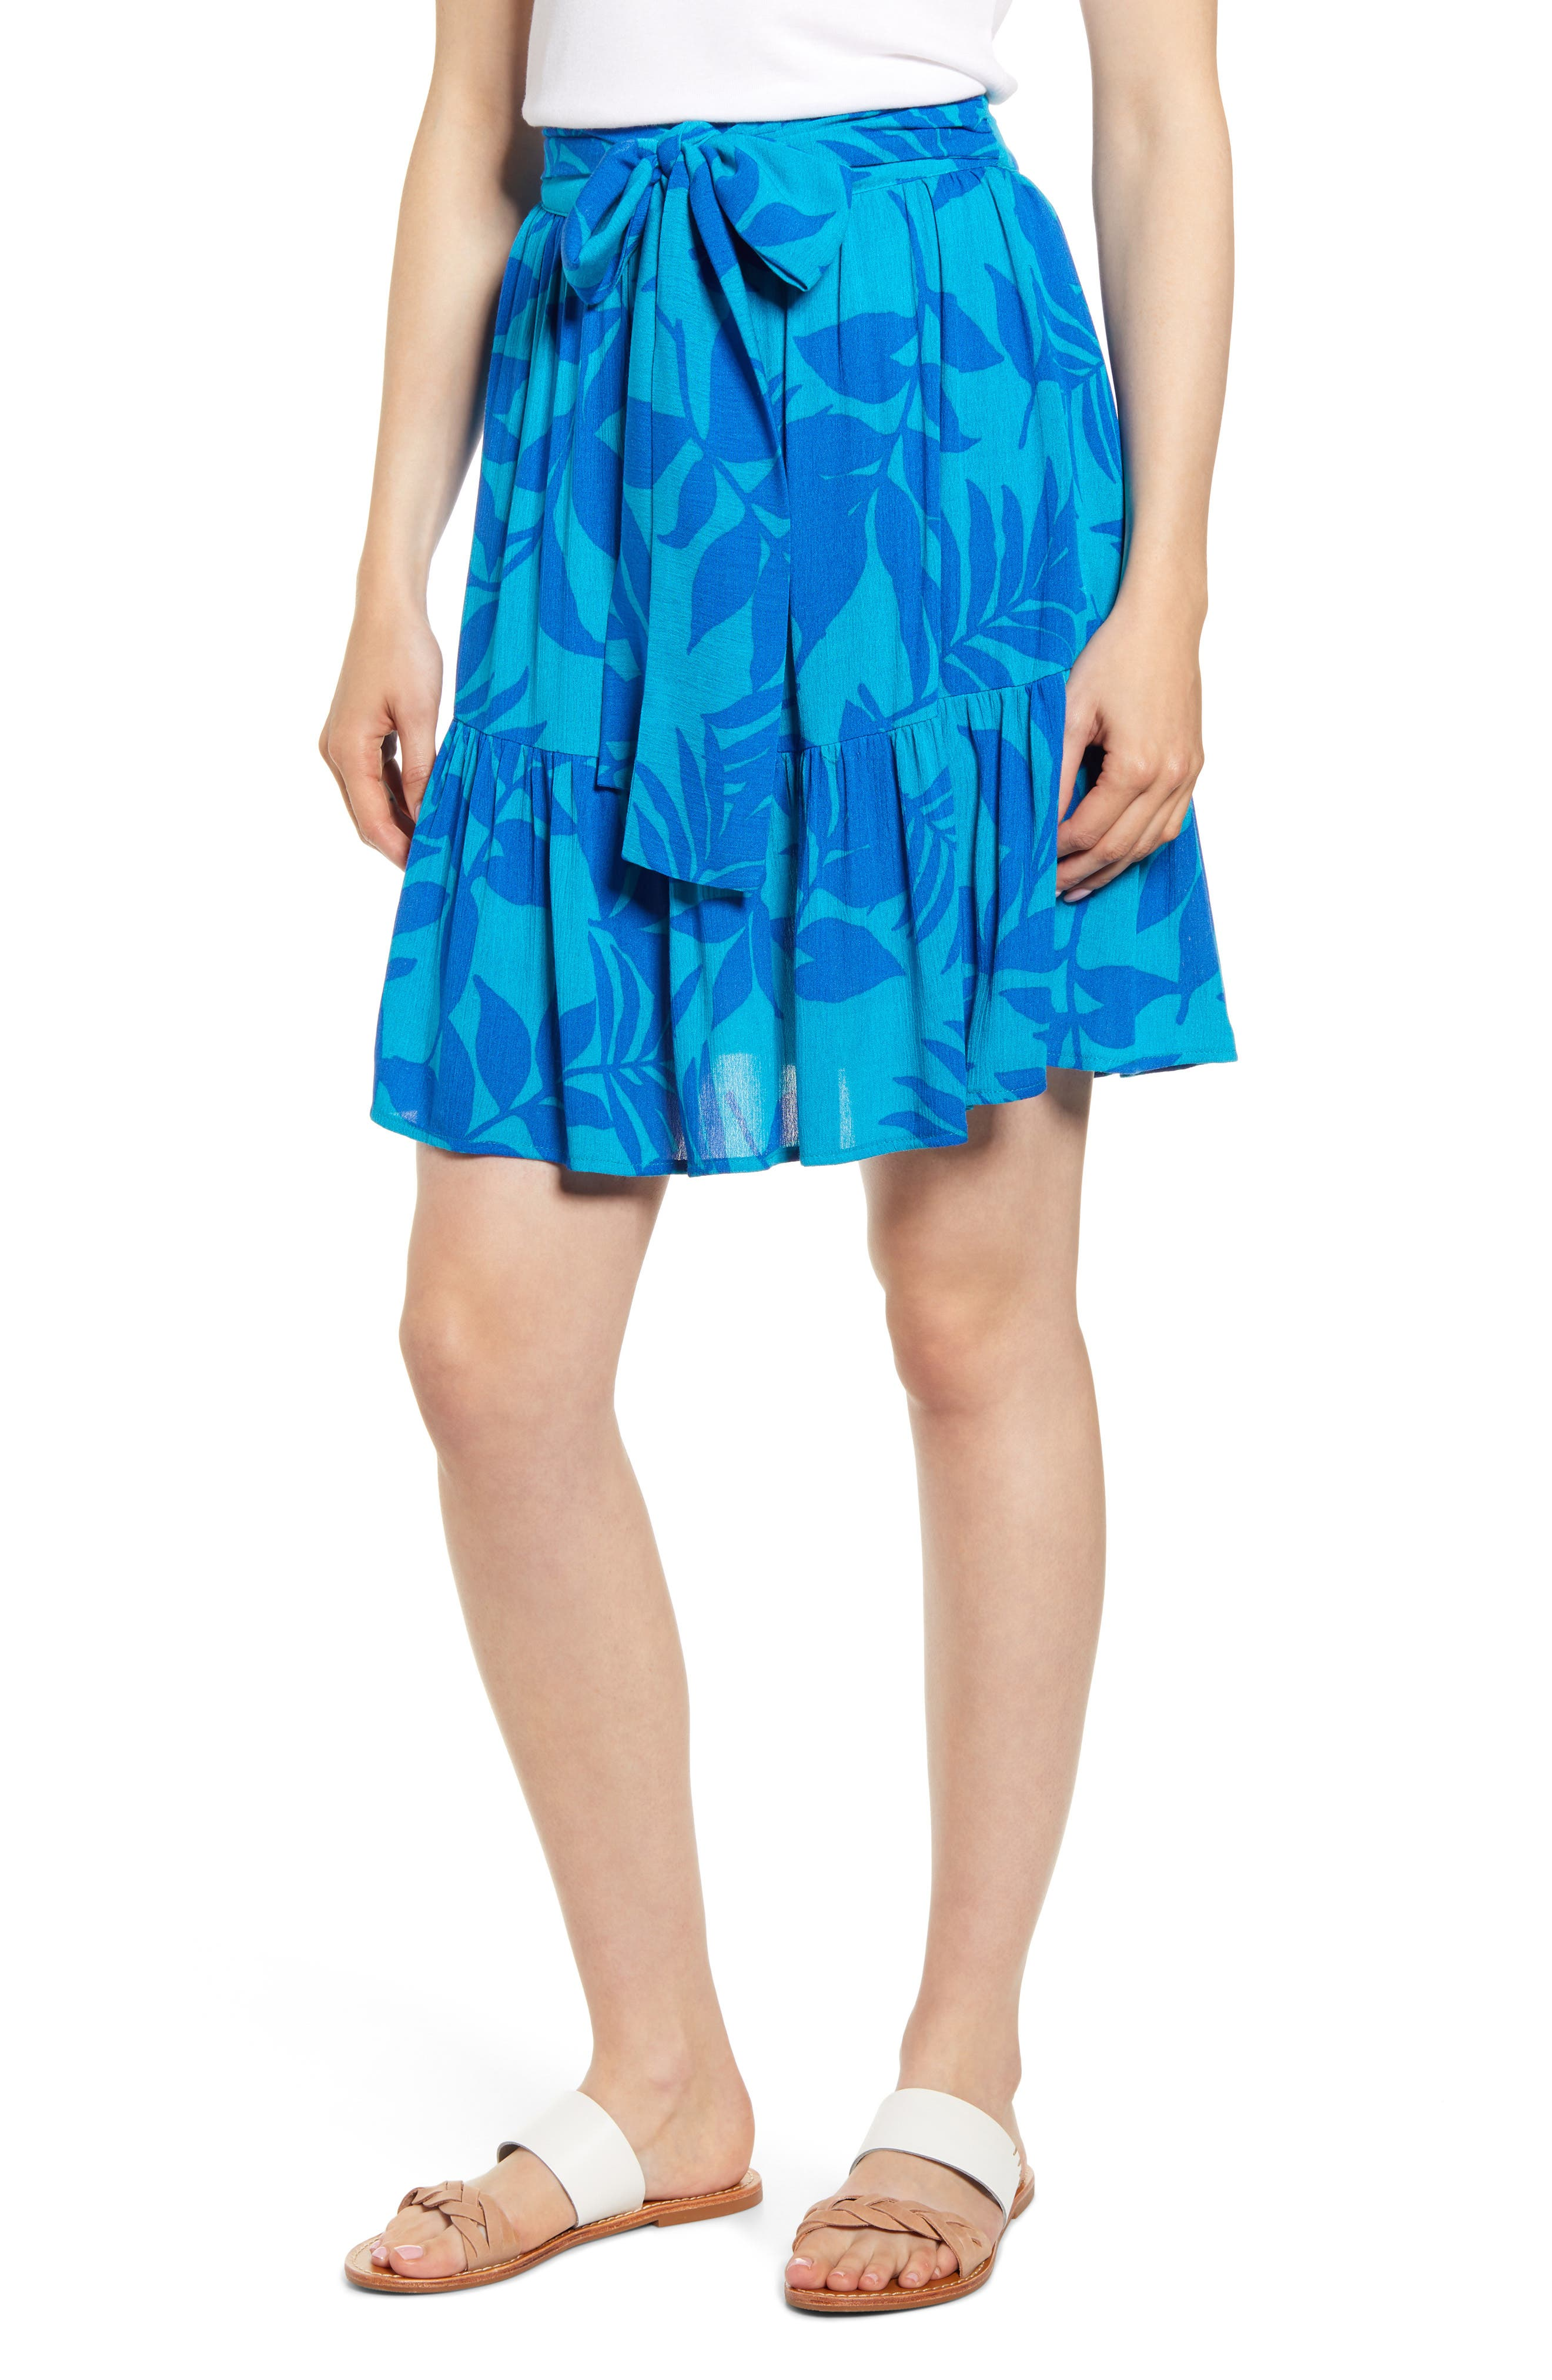 Petite Gibson X Hi Sugarplum! Capri Tiered Tie Front Summer Skirt, Orange